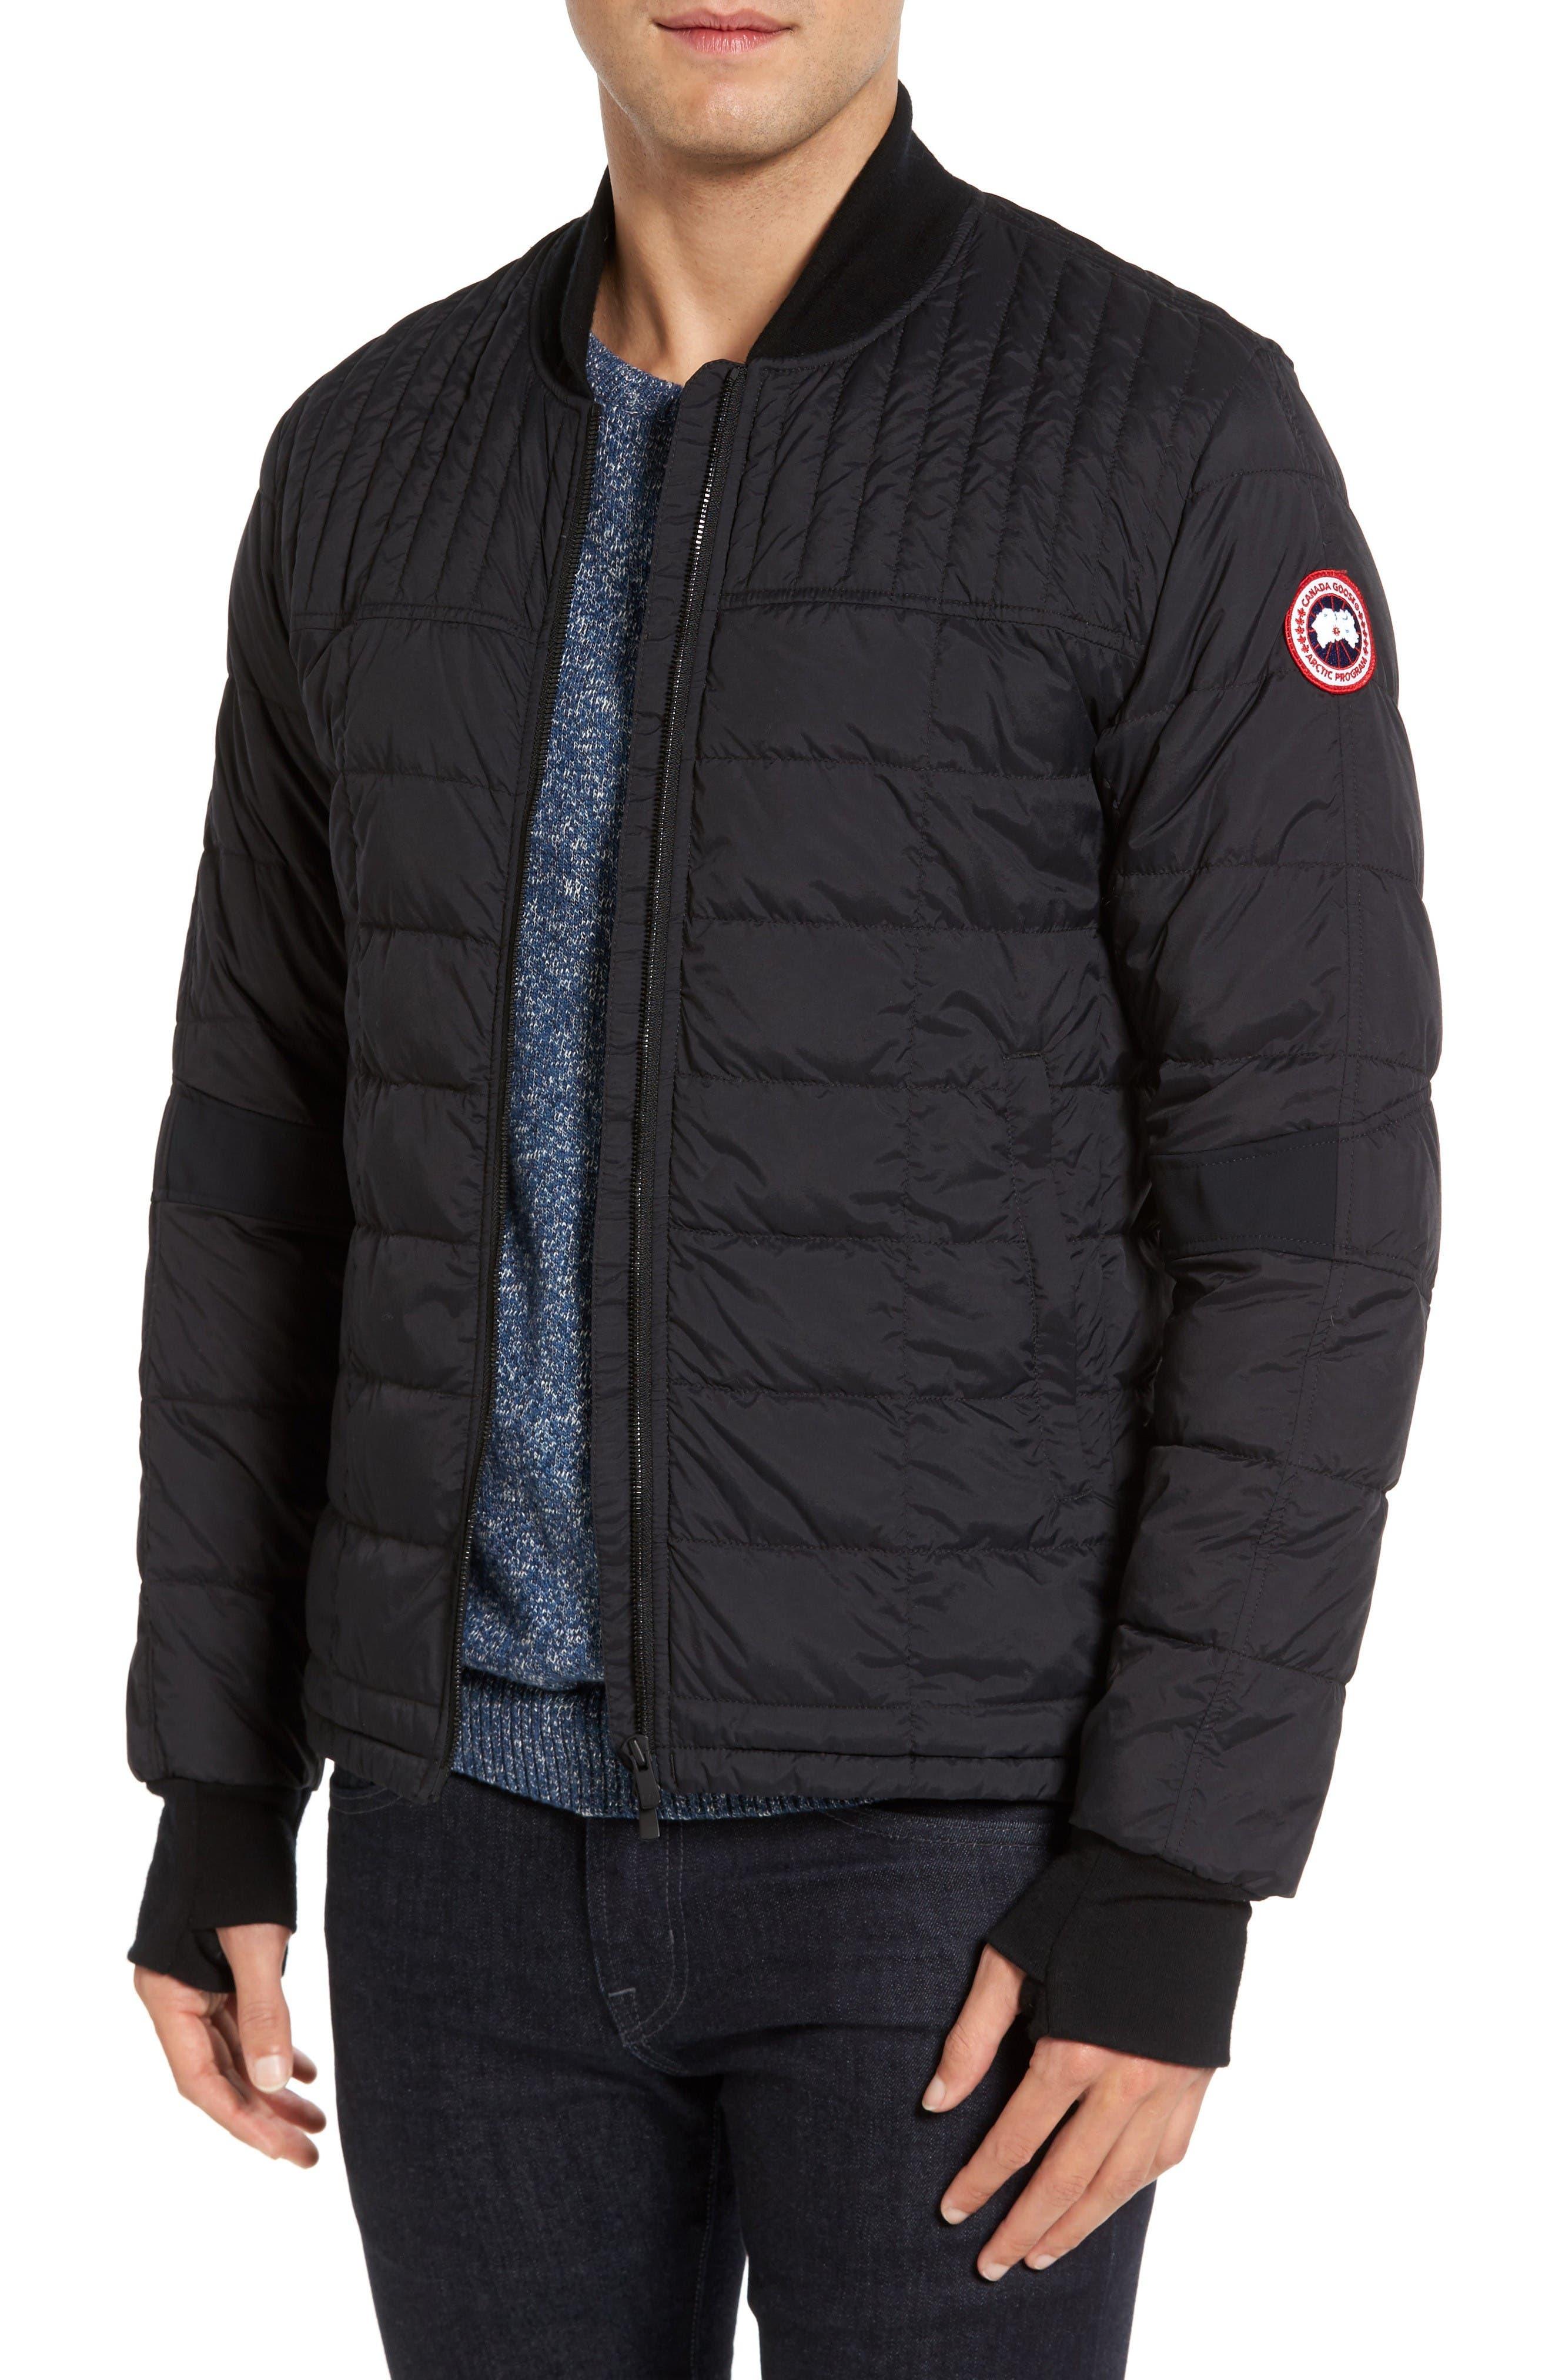 Dunham Down Bomber Jacket,                         Main,                         color, Black